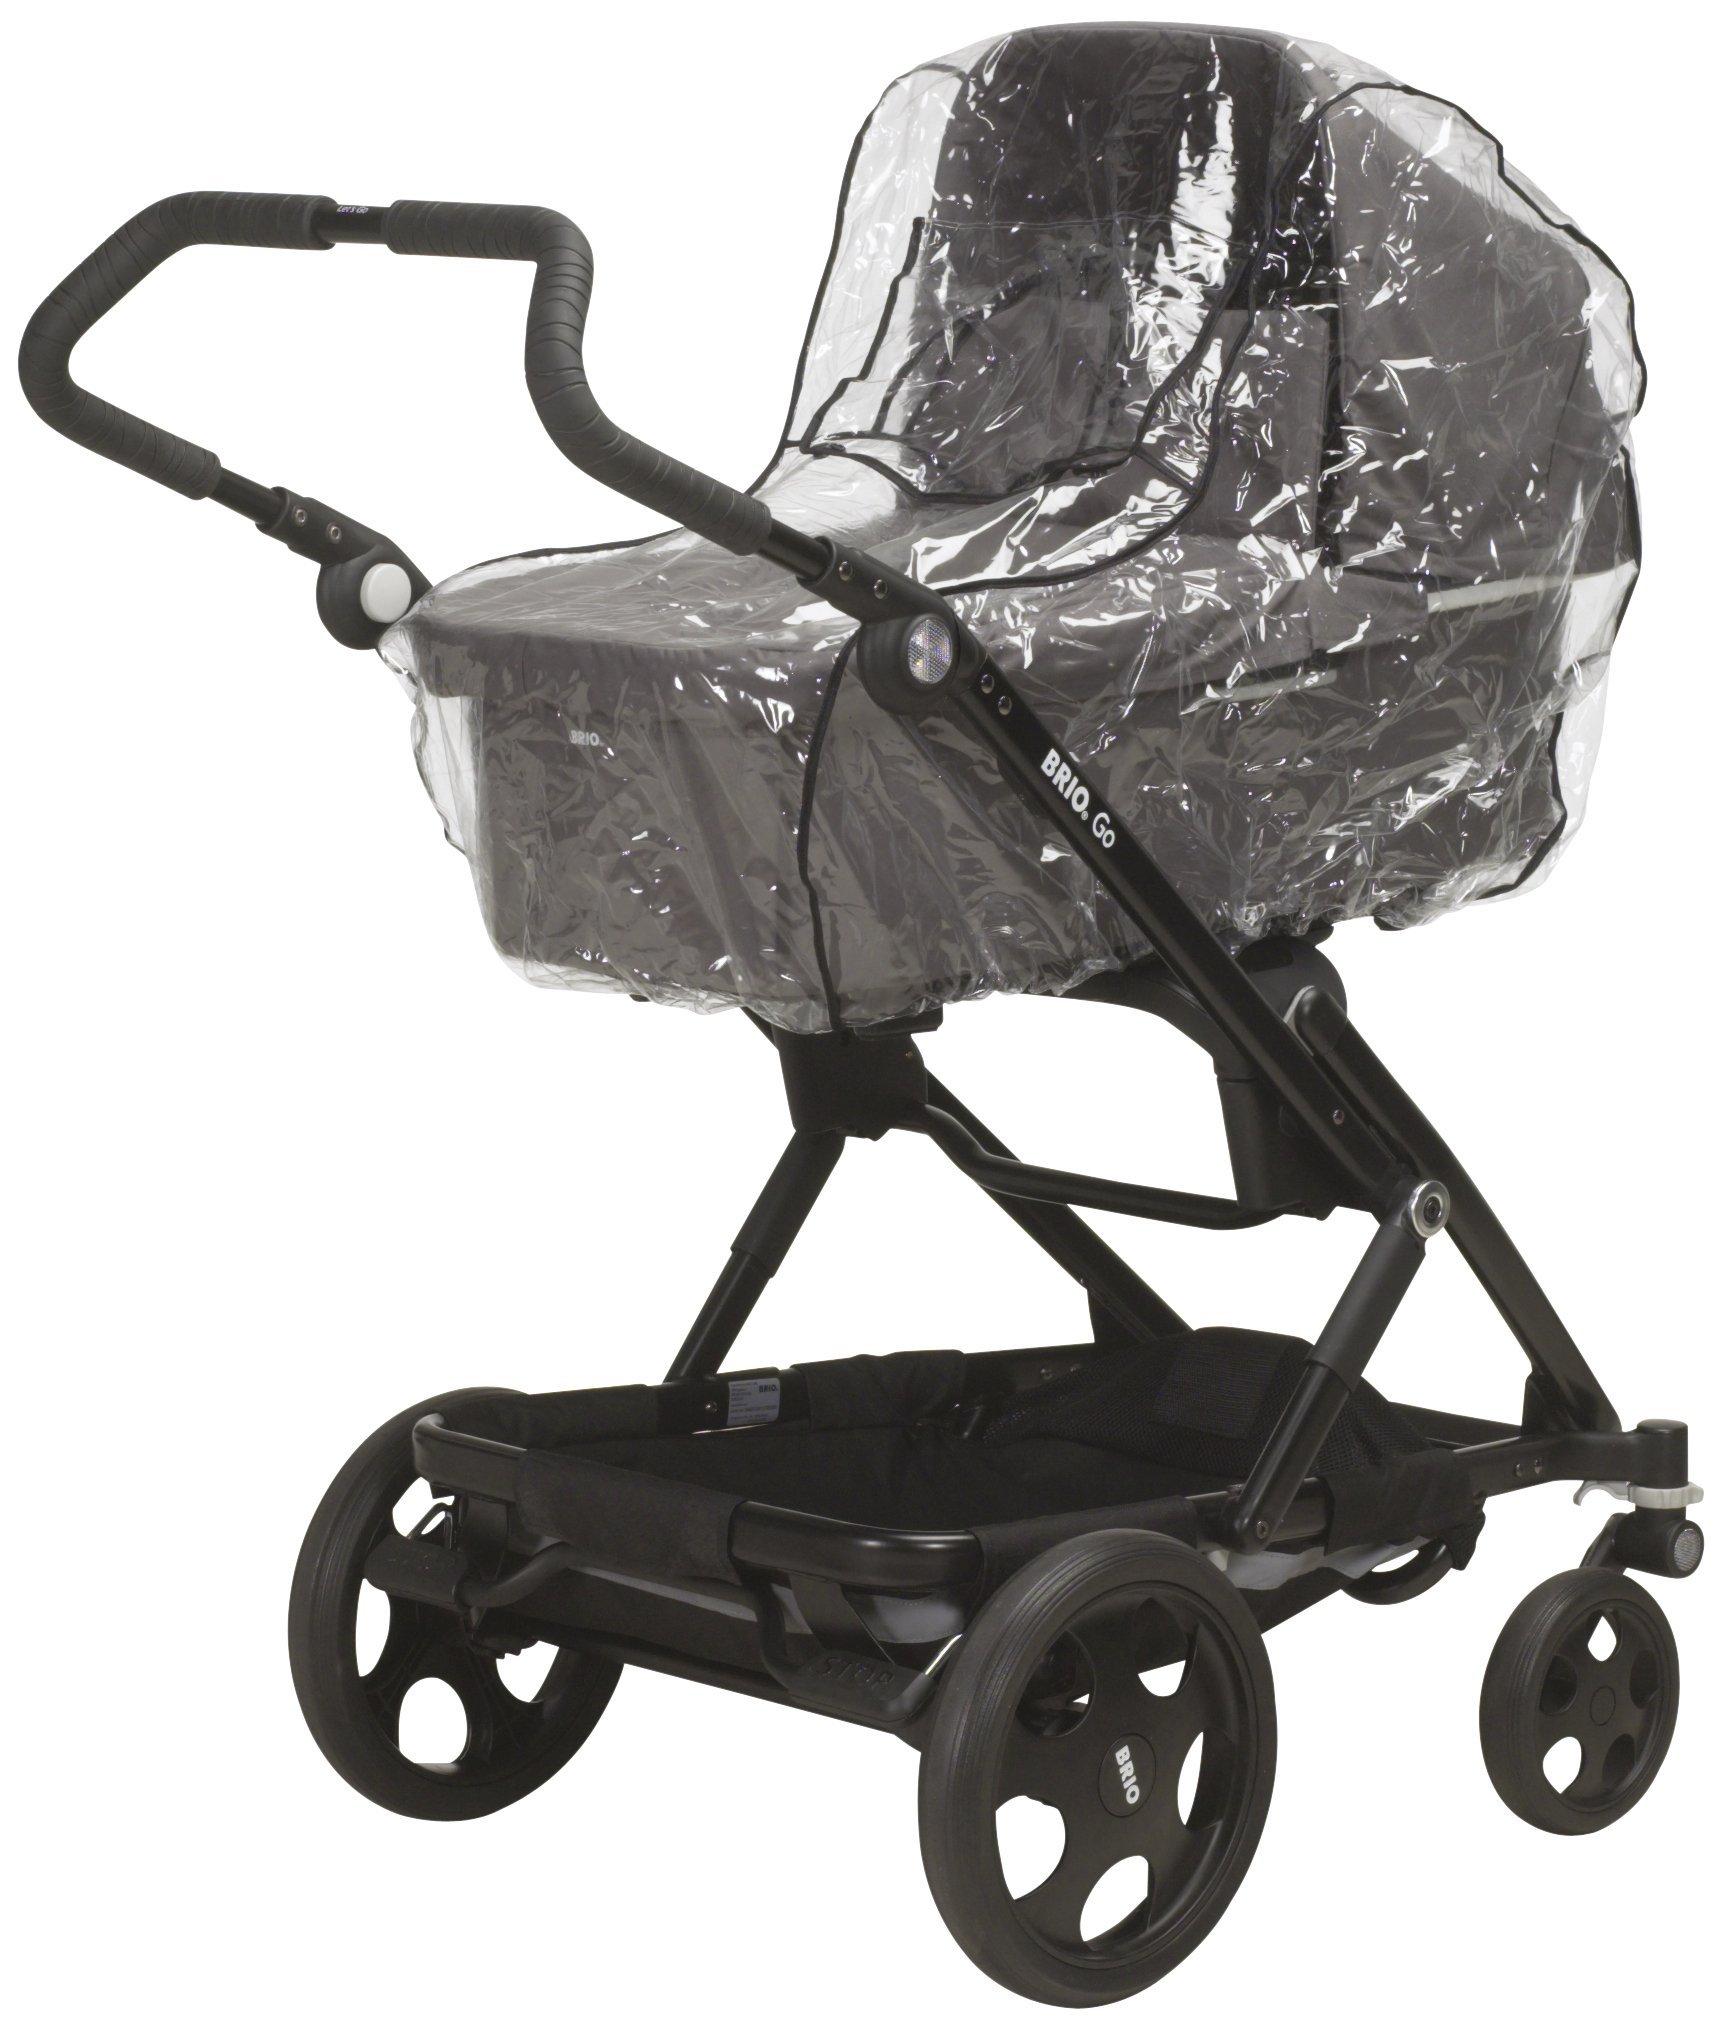 Universal Rain Cover Chair For Baby Pram Car Buggy Pushchair Stroller UK